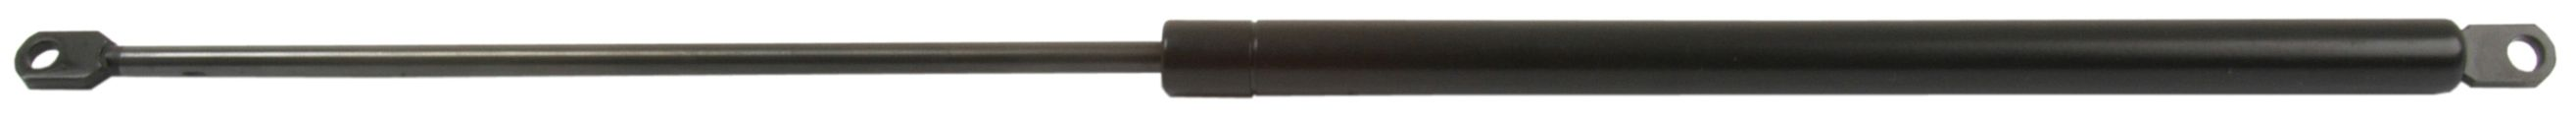 RENAULT GAS STRUT 54519